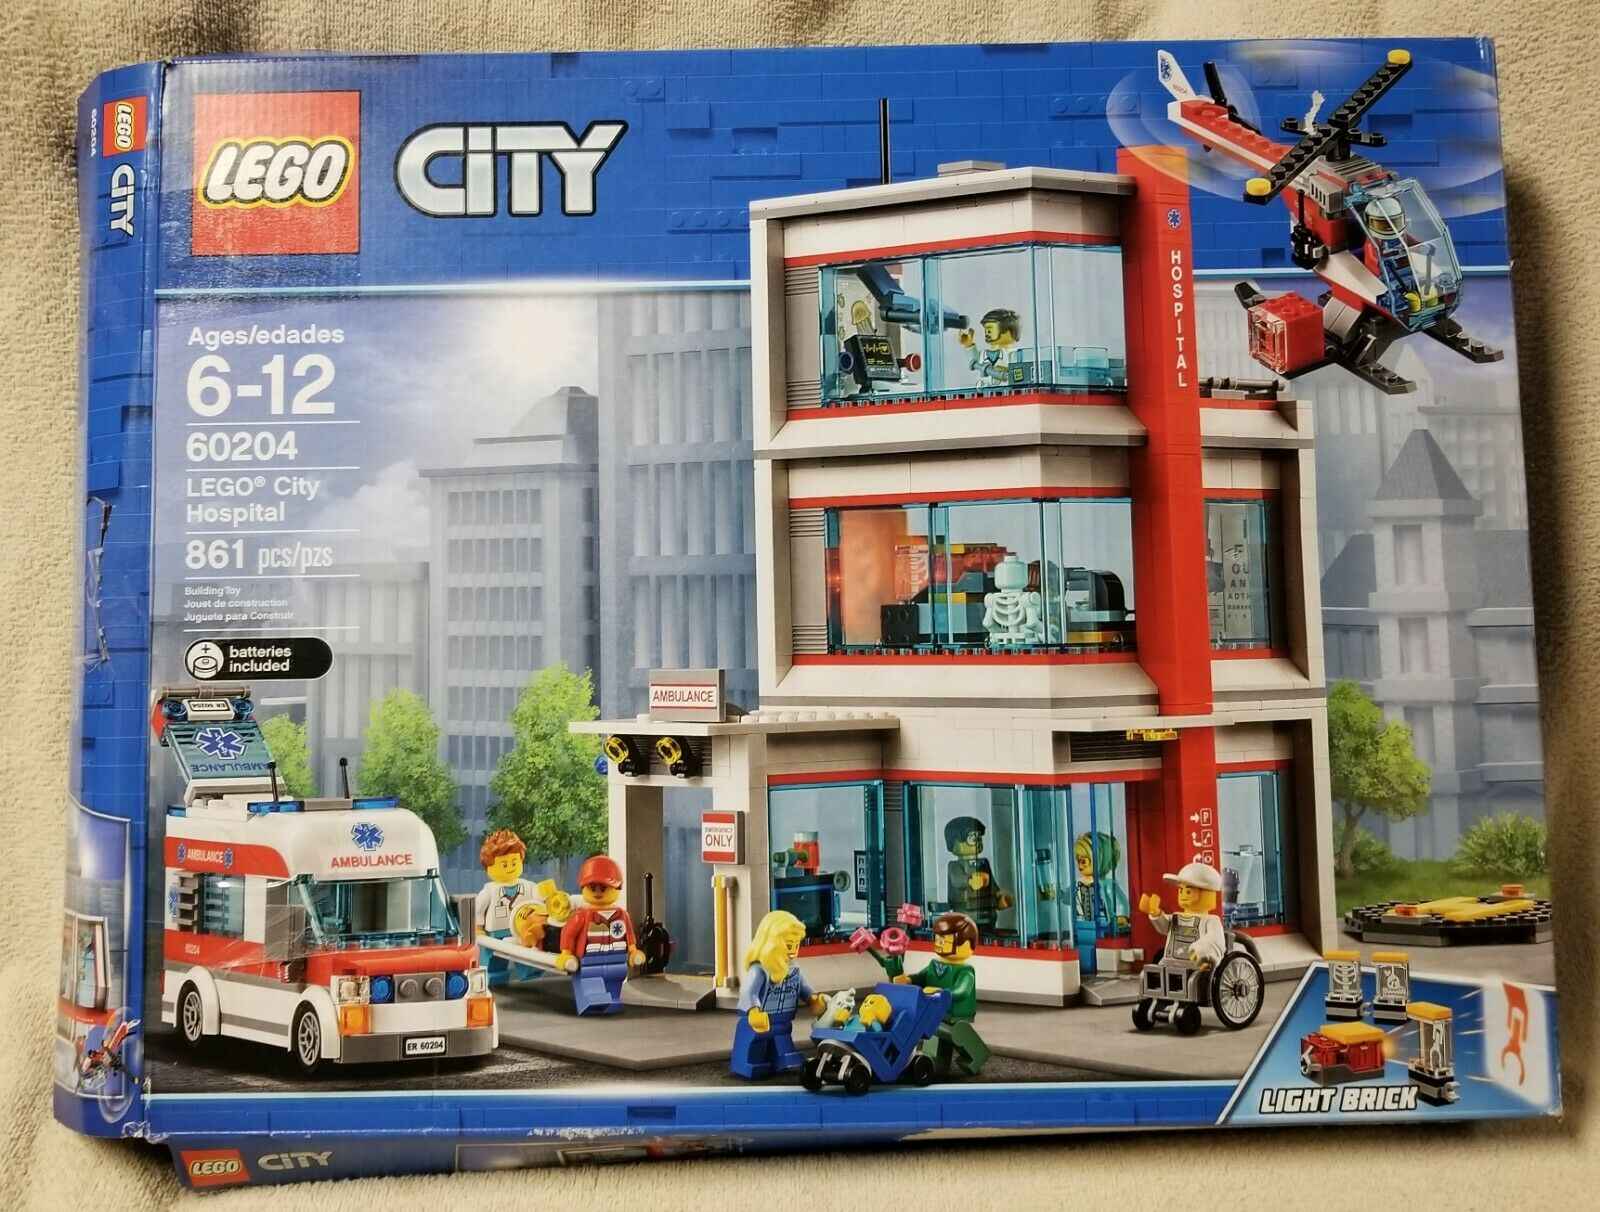 Lego City 60204 hospital 861 piezas Bolsas de caja abierta sin usar Sellado 11 Minifiguras